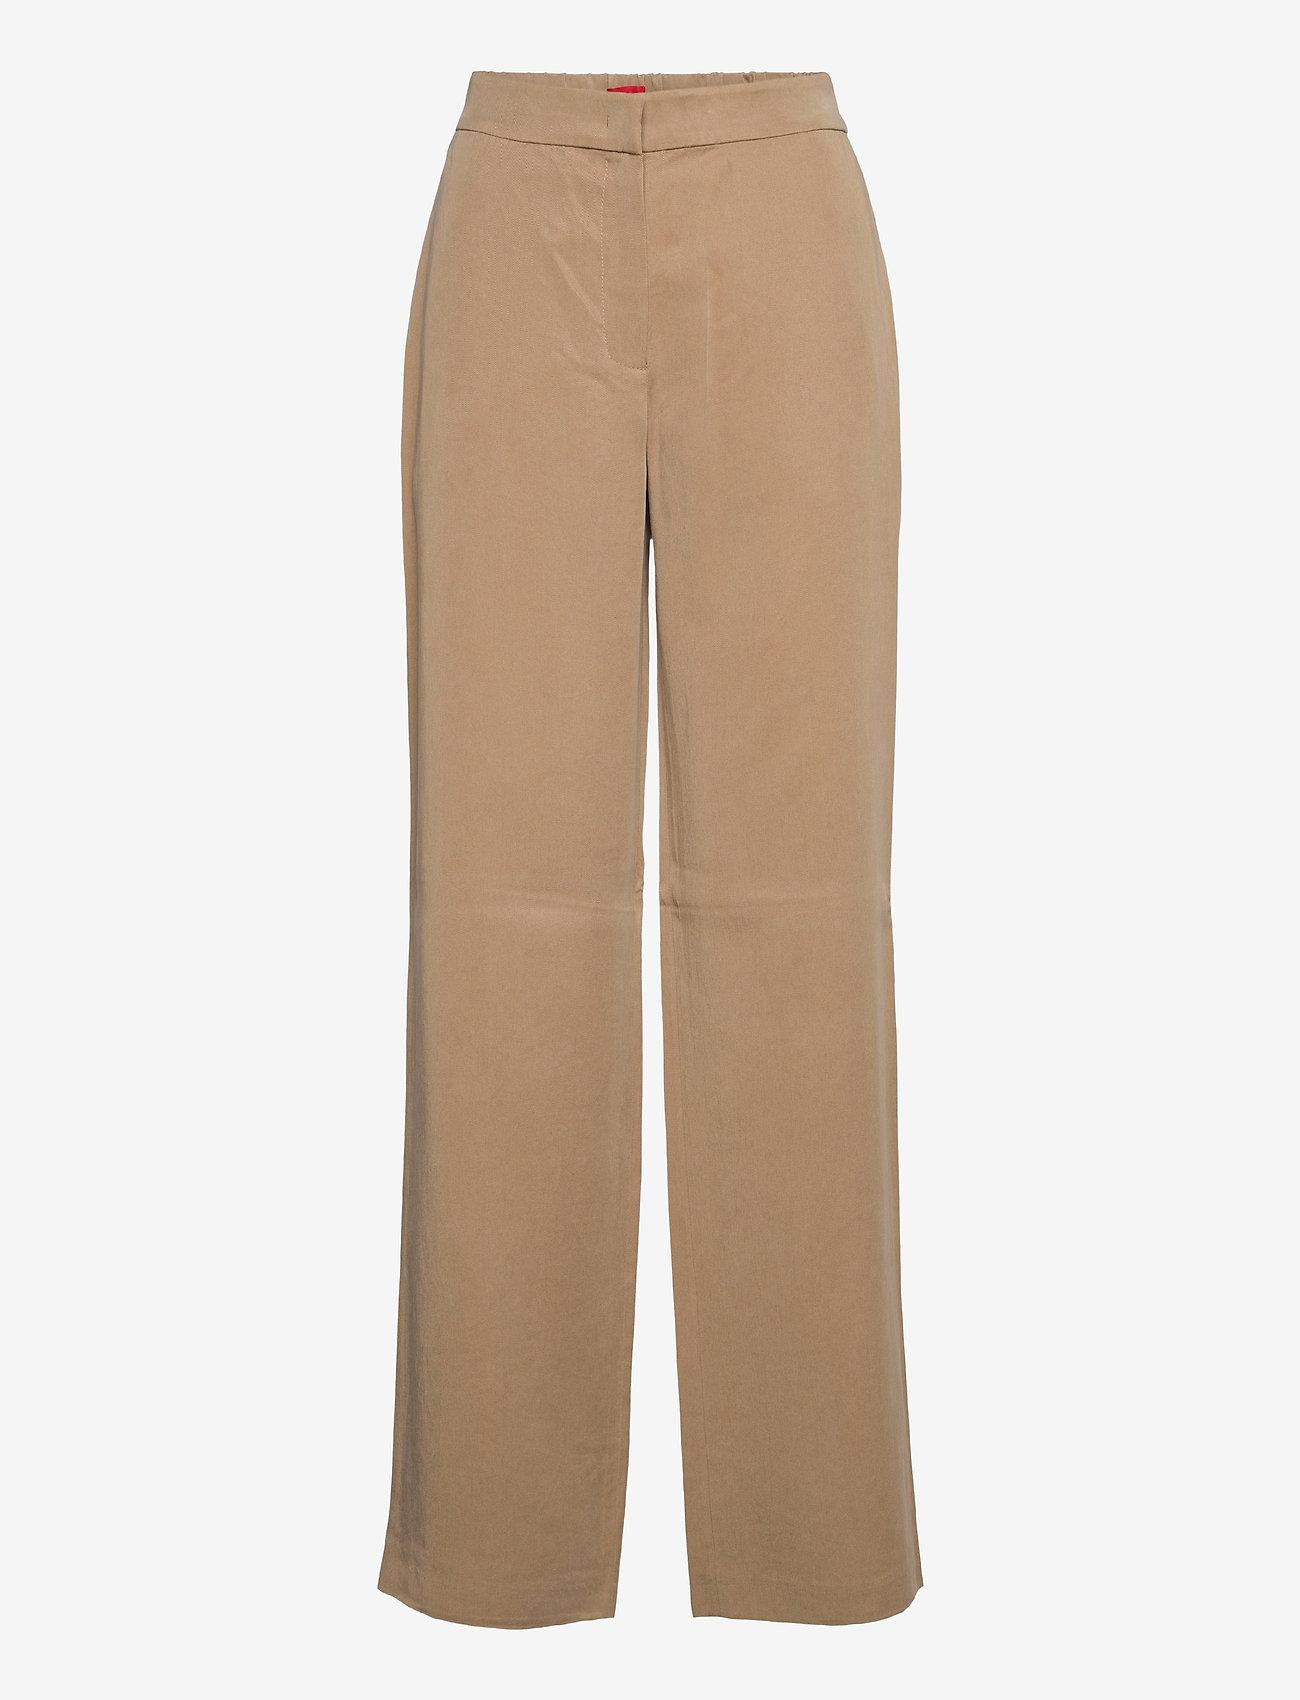 HUGO - Hibari-1 - pantalons larges - light beige - 0